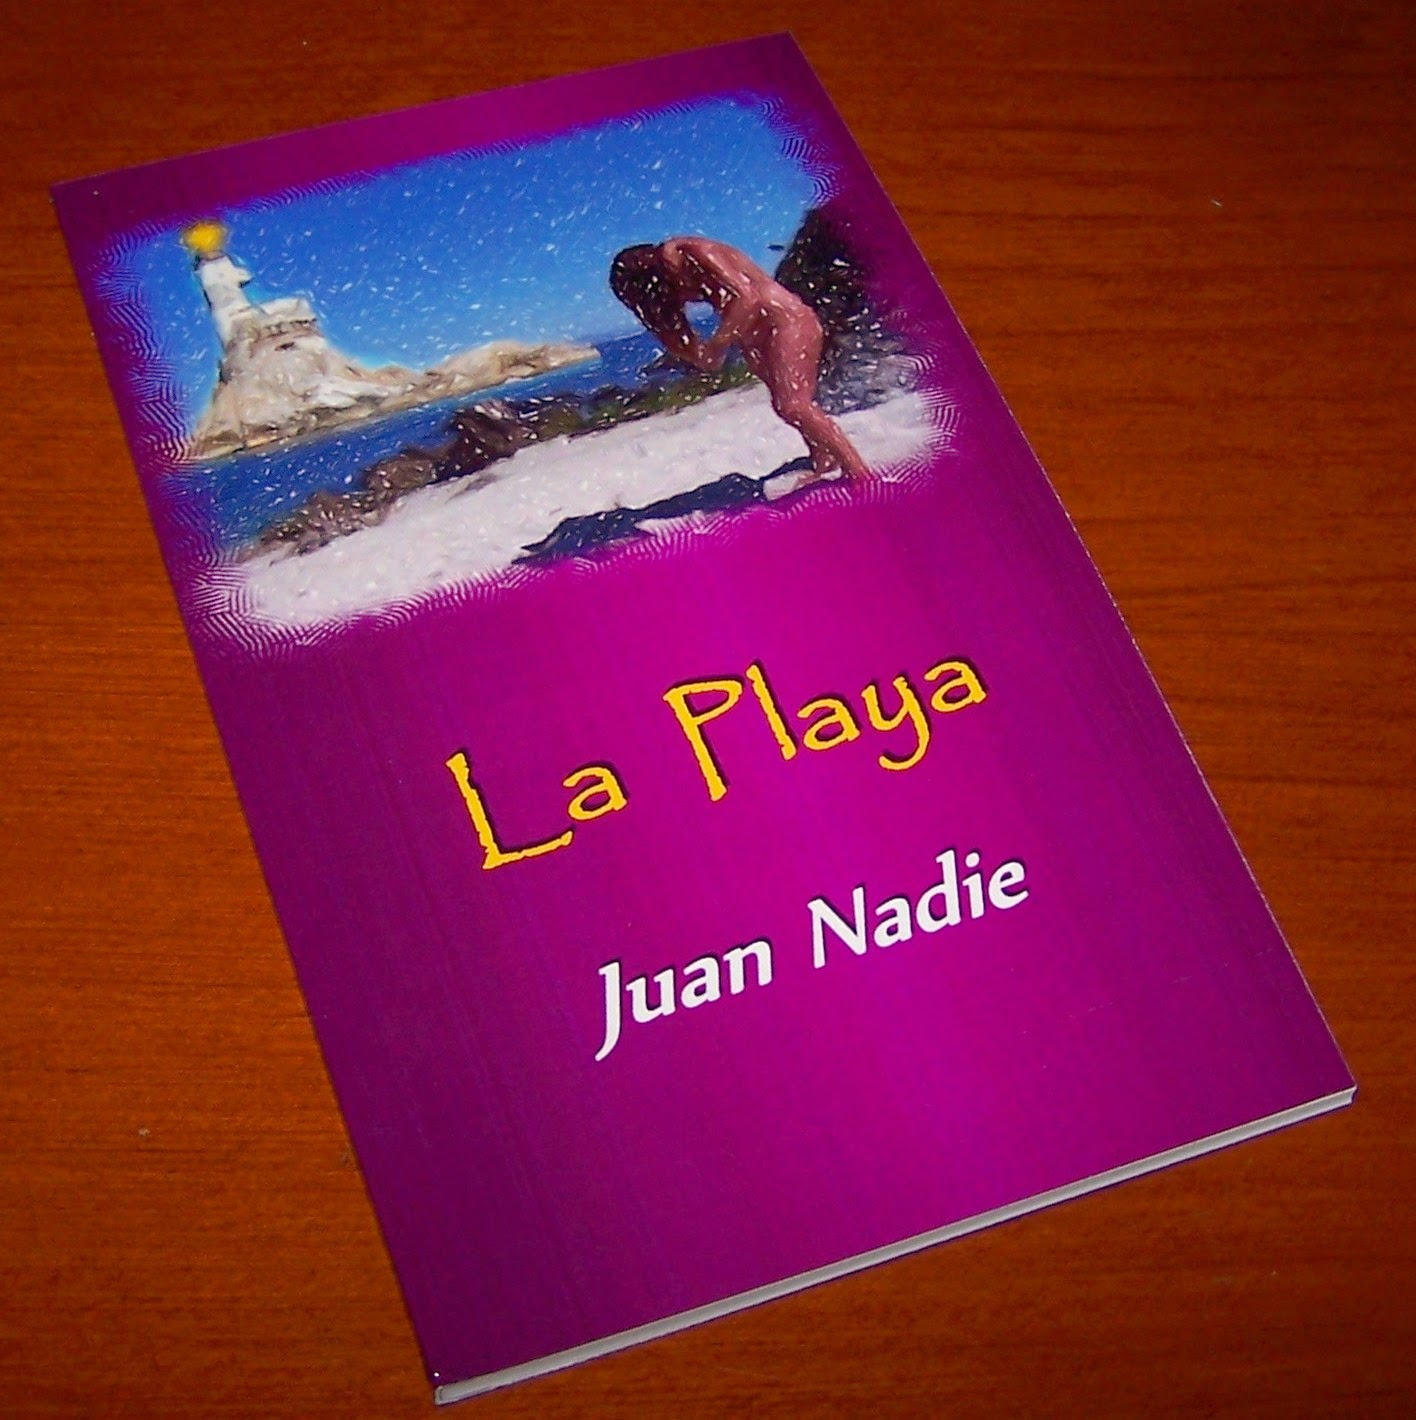 http://www.lulu.com/shop/juan-nadie/la-playa/paperback/product-21635518.html